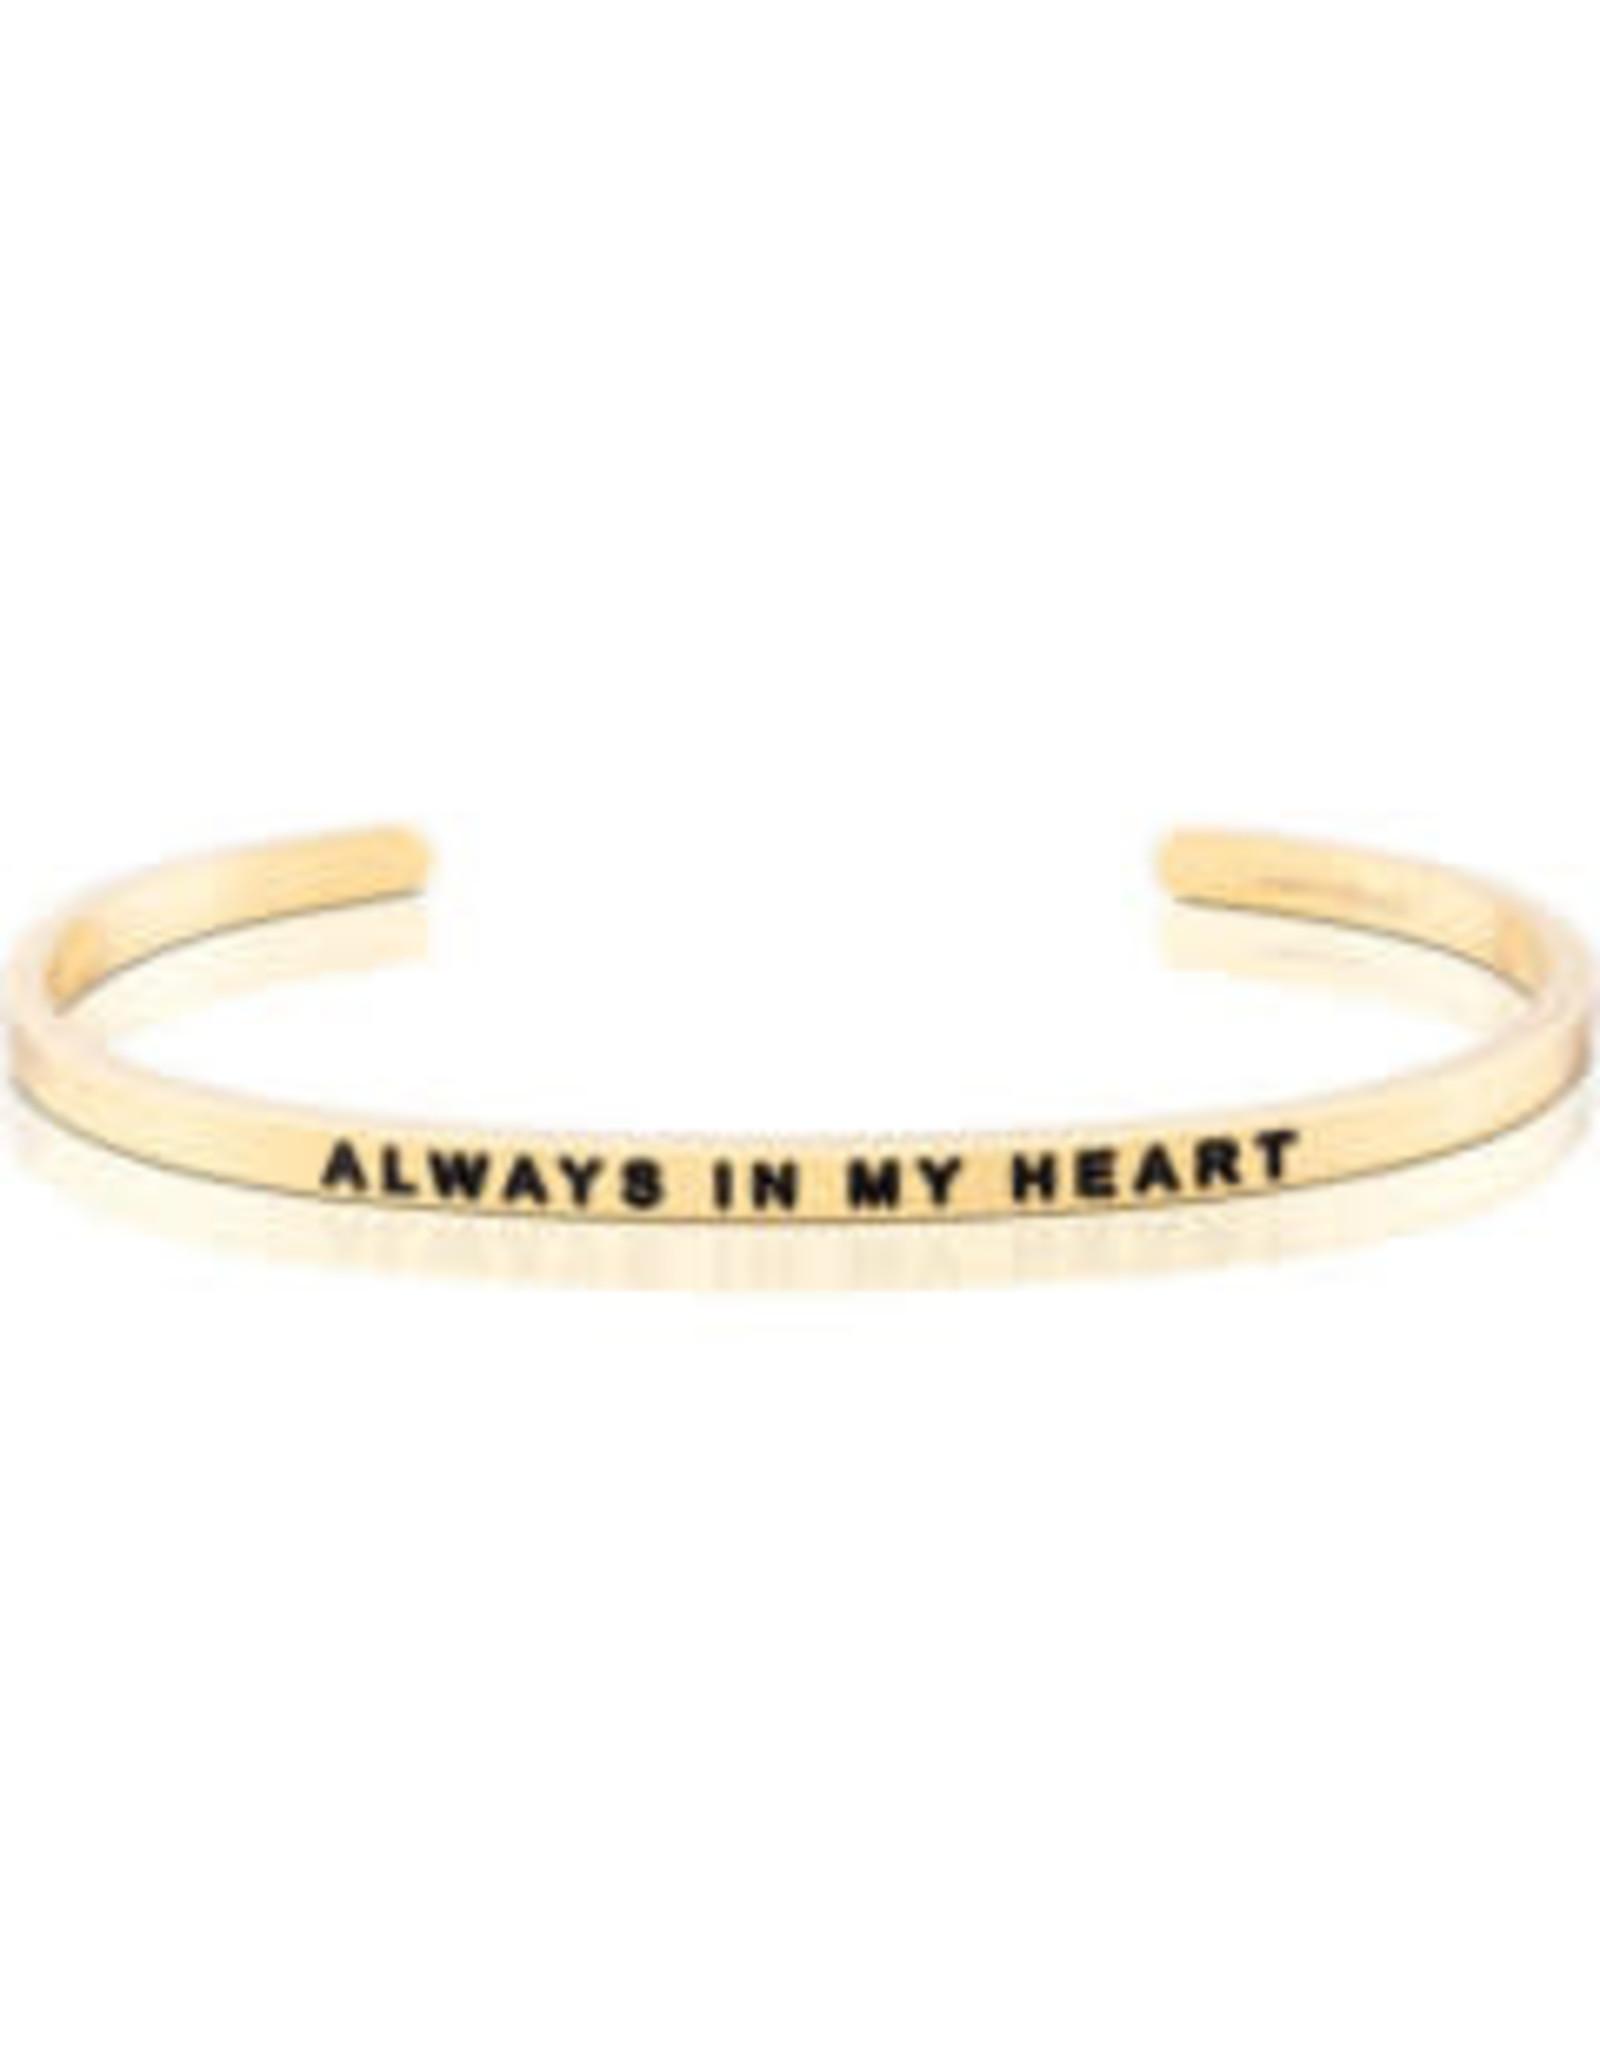 MantraBand MantraBand Bracelet, Always In My Heart